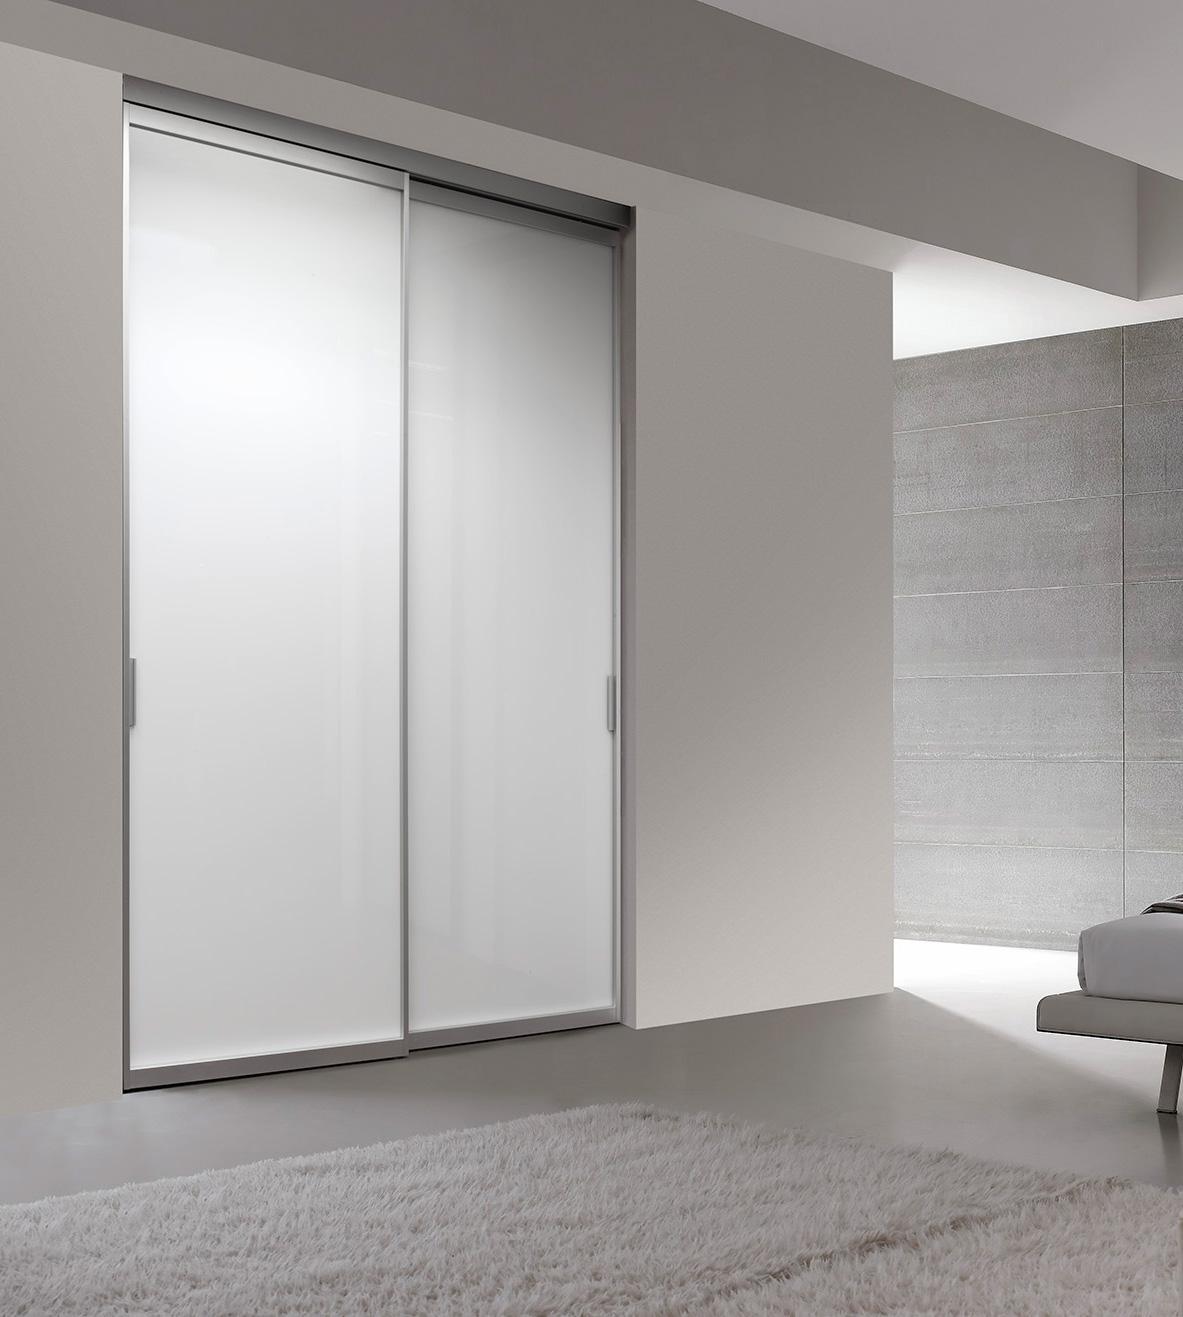 Cabine armadio e porte - Porte scorrevoli per cabine armadio ...